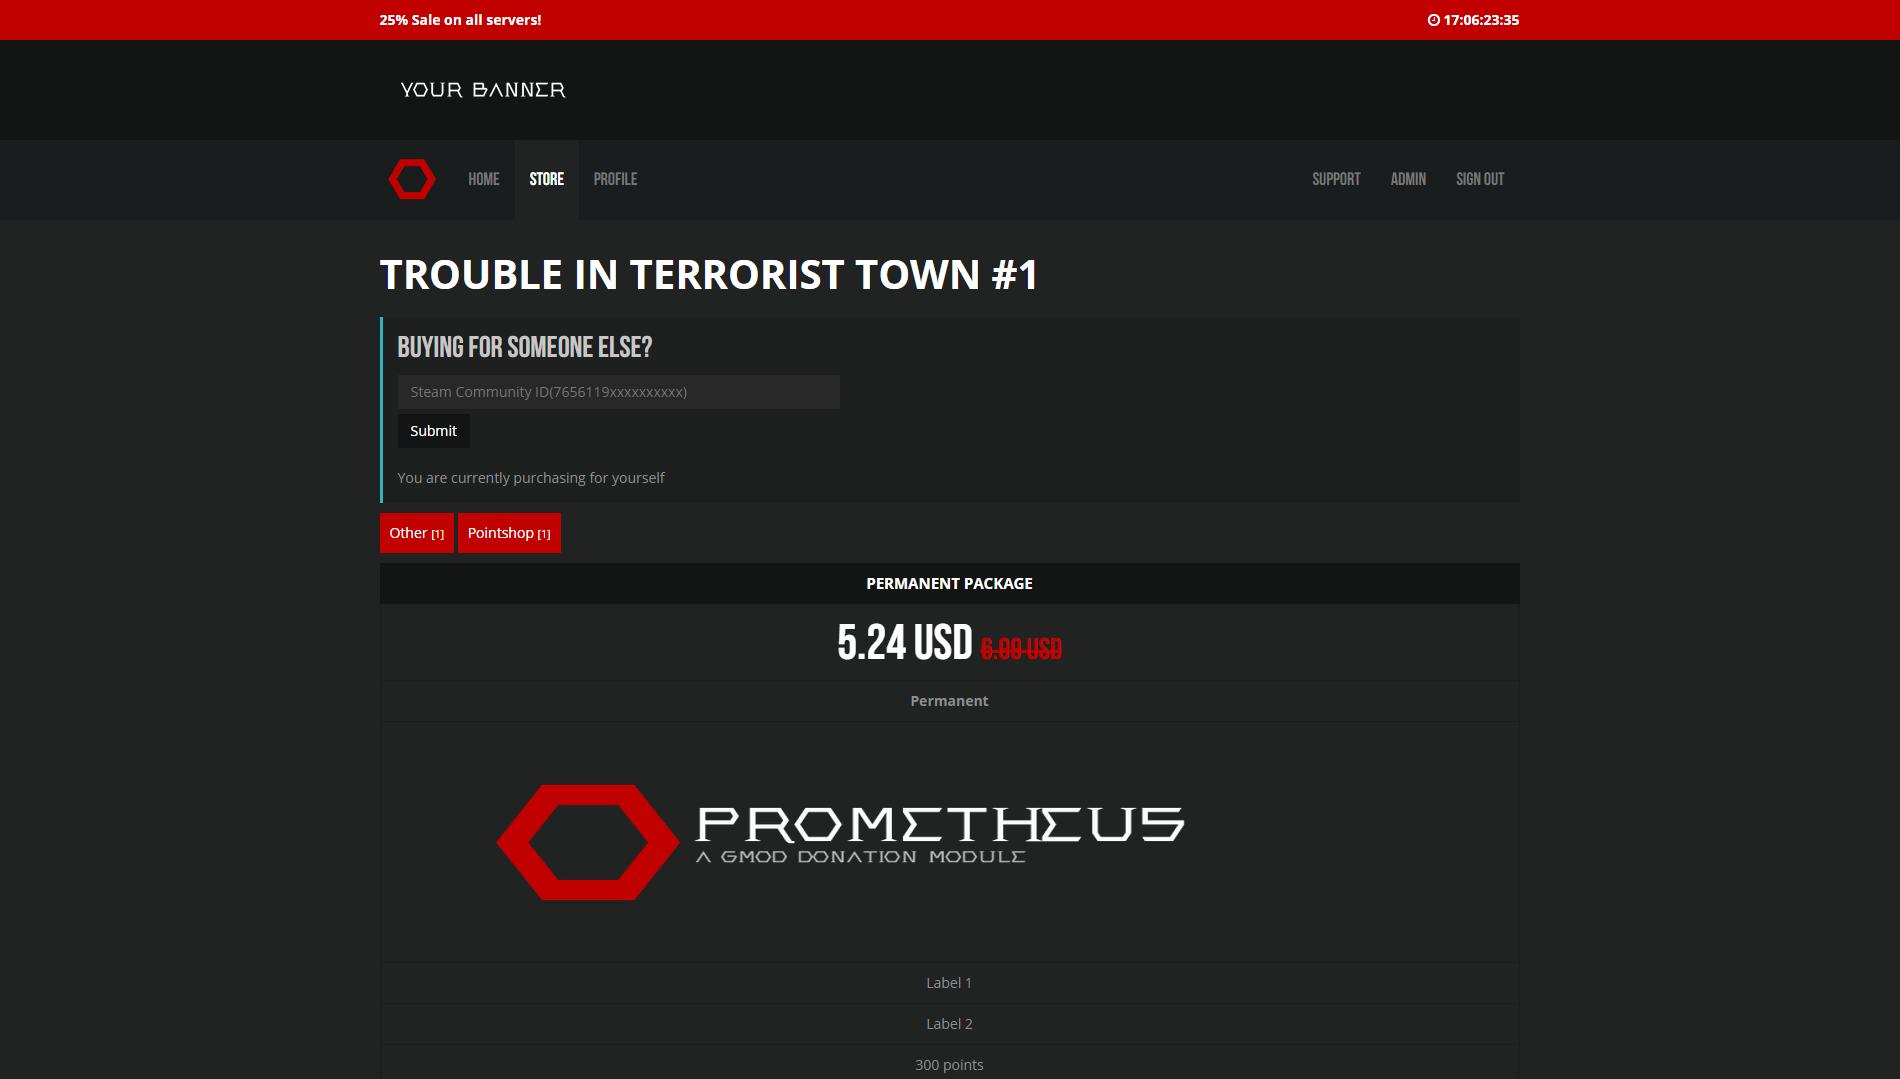 Prometheus - A GMod Donation System